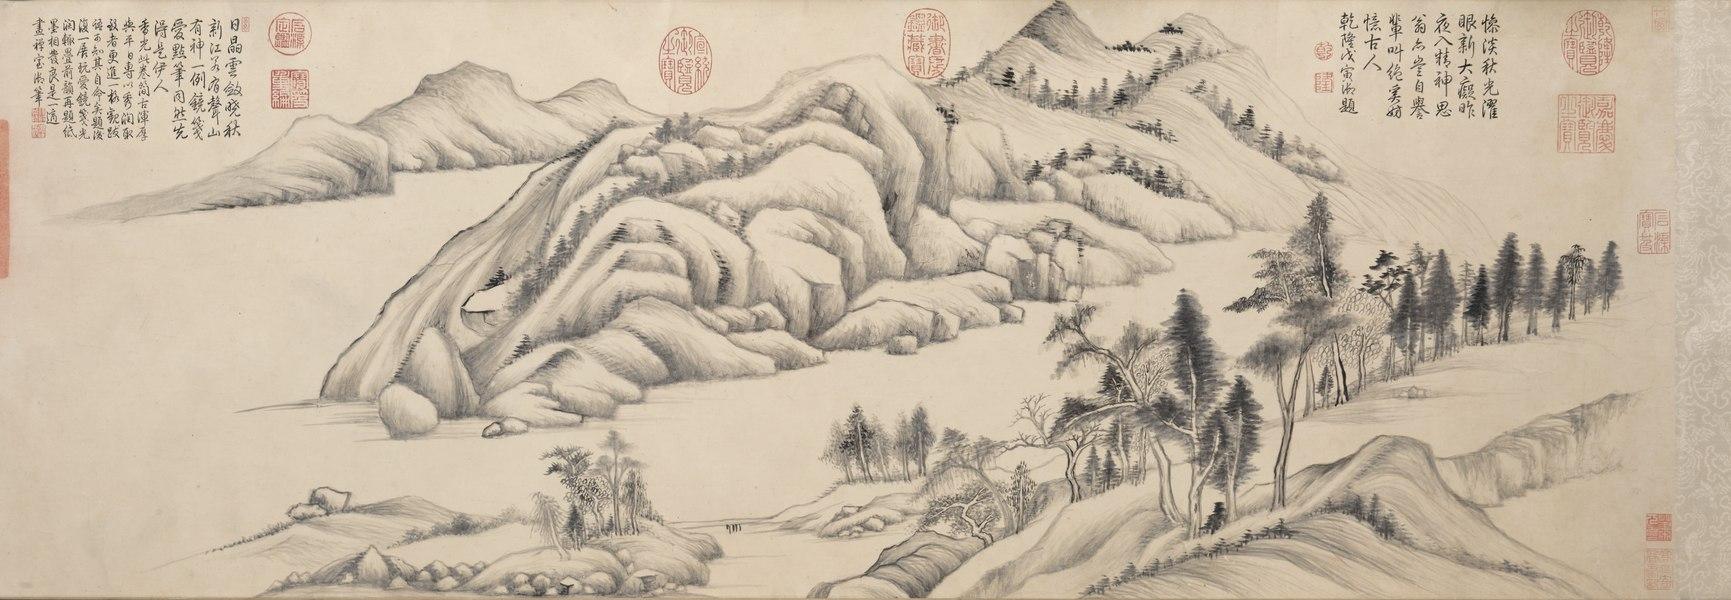 dong qichang - image 8